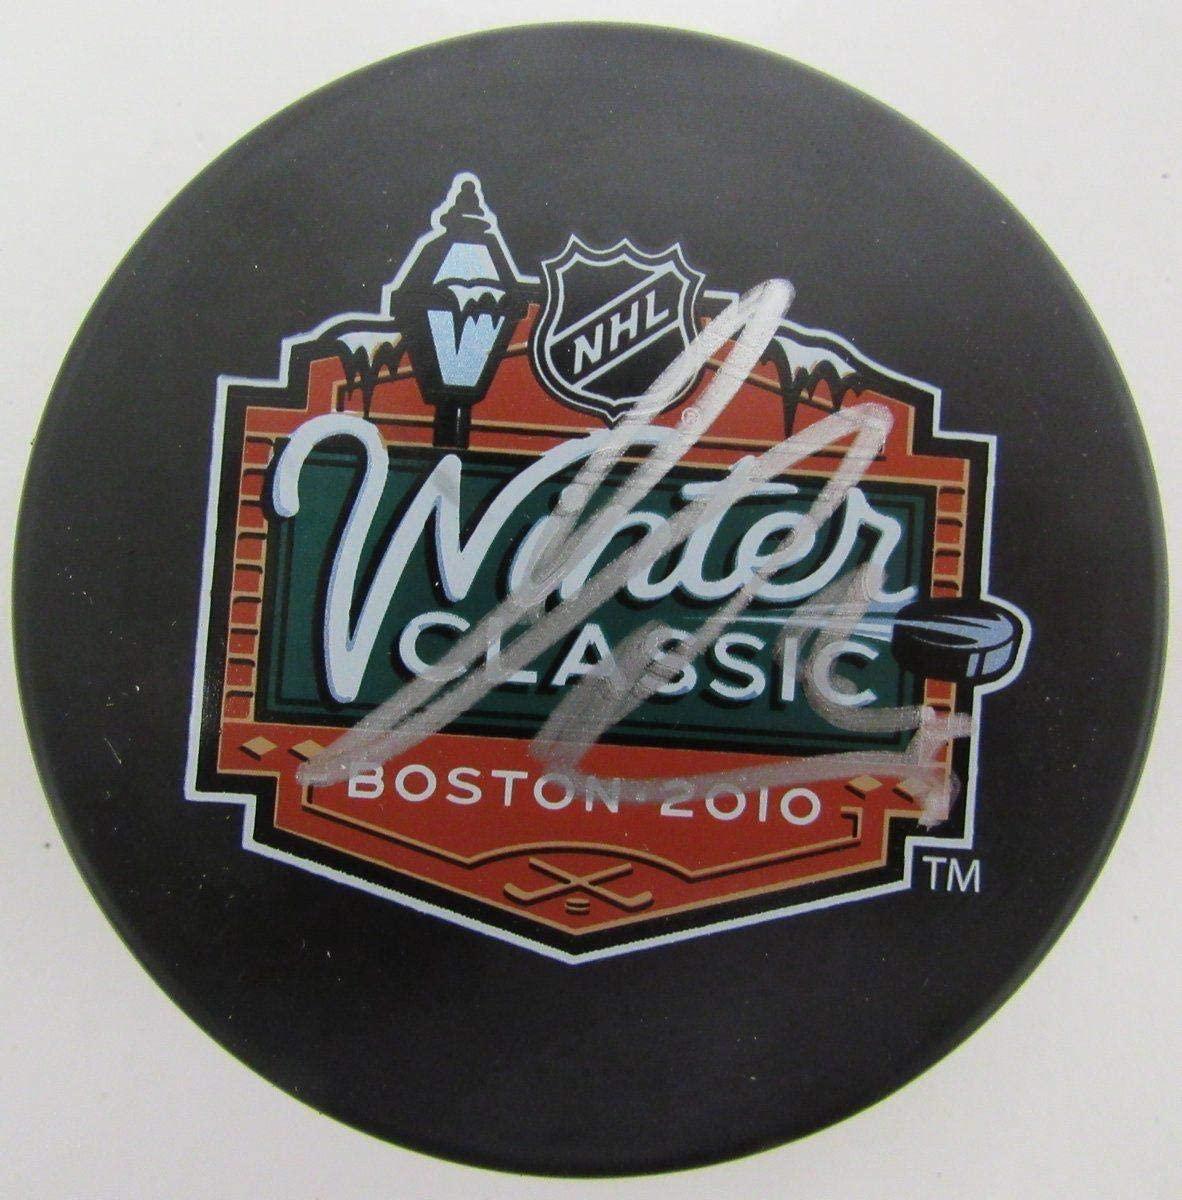 James van Riemsdyk Signed Hockey Puck - Winter Classic Logo 139235 - JSA Certified - Autographed NHL Pucks